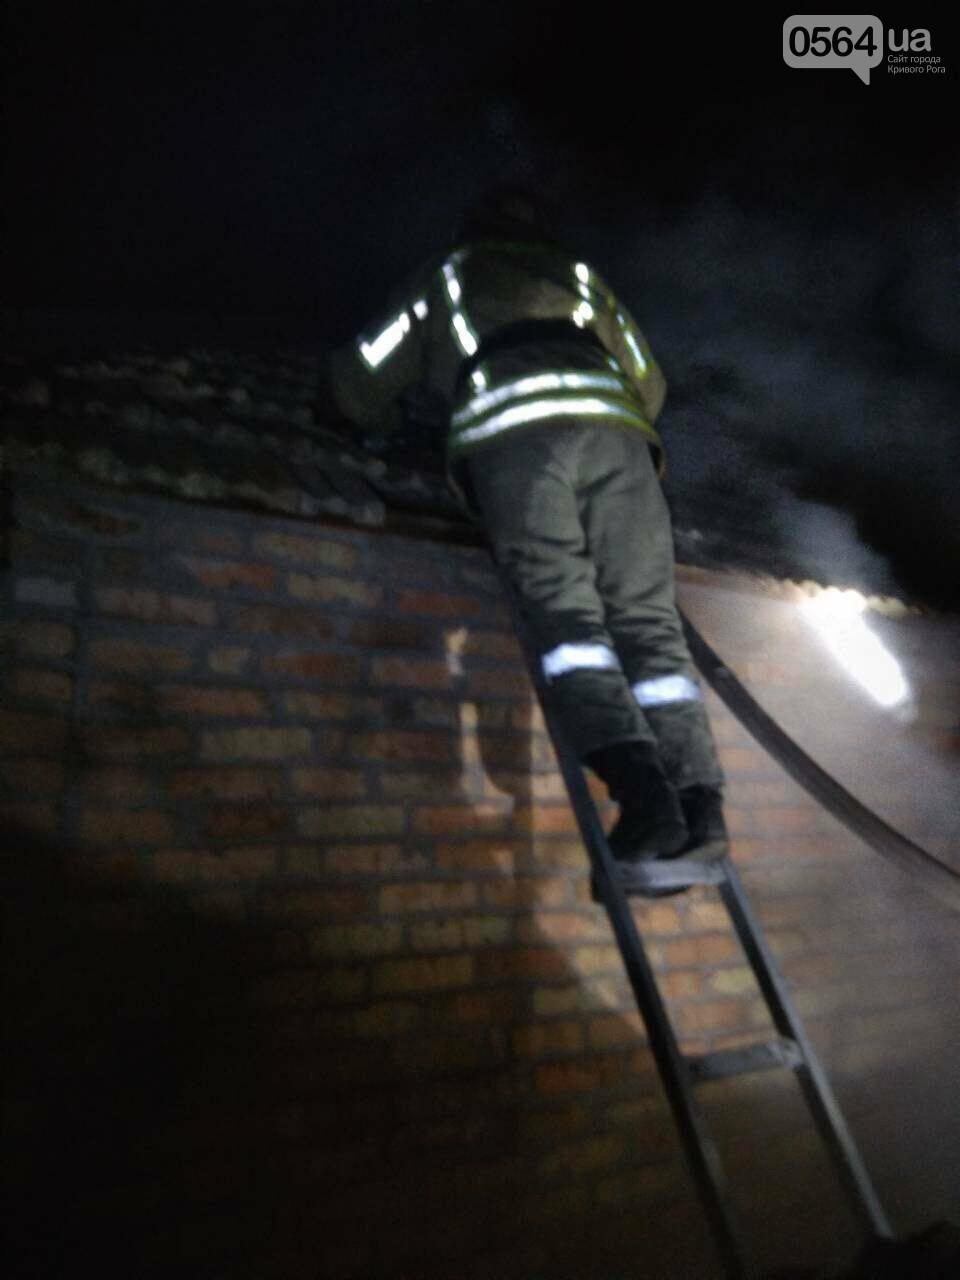 На пожаре в Кривом Роге пострадал пенсионер, - ФОТО , фото-2